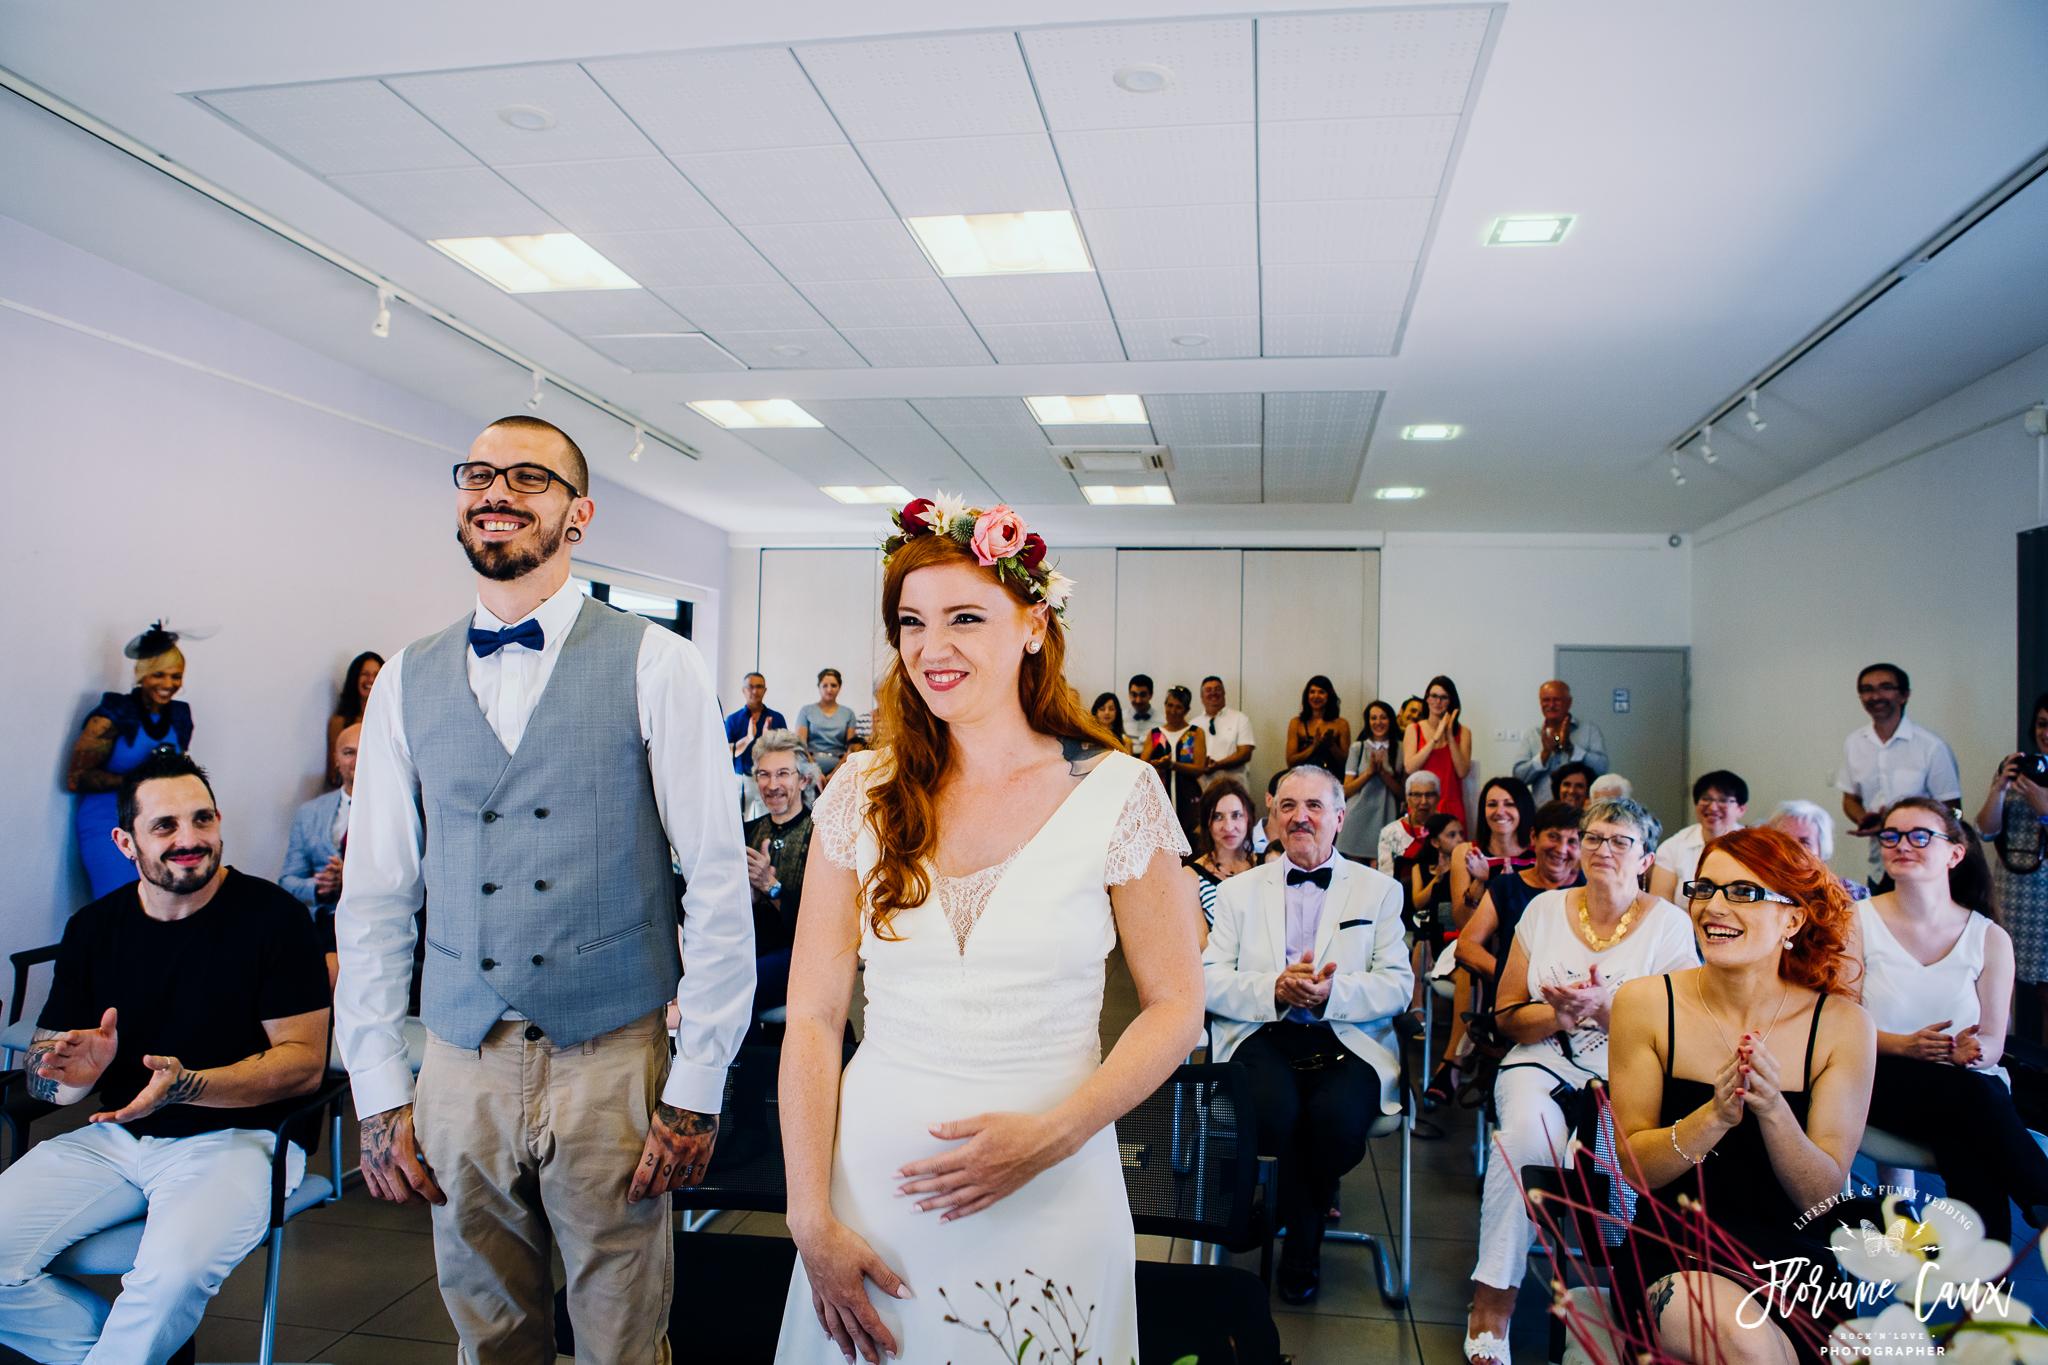 photographe-mariage-toulouse-rocknroll-maries-tatoues-floriane-caux-28